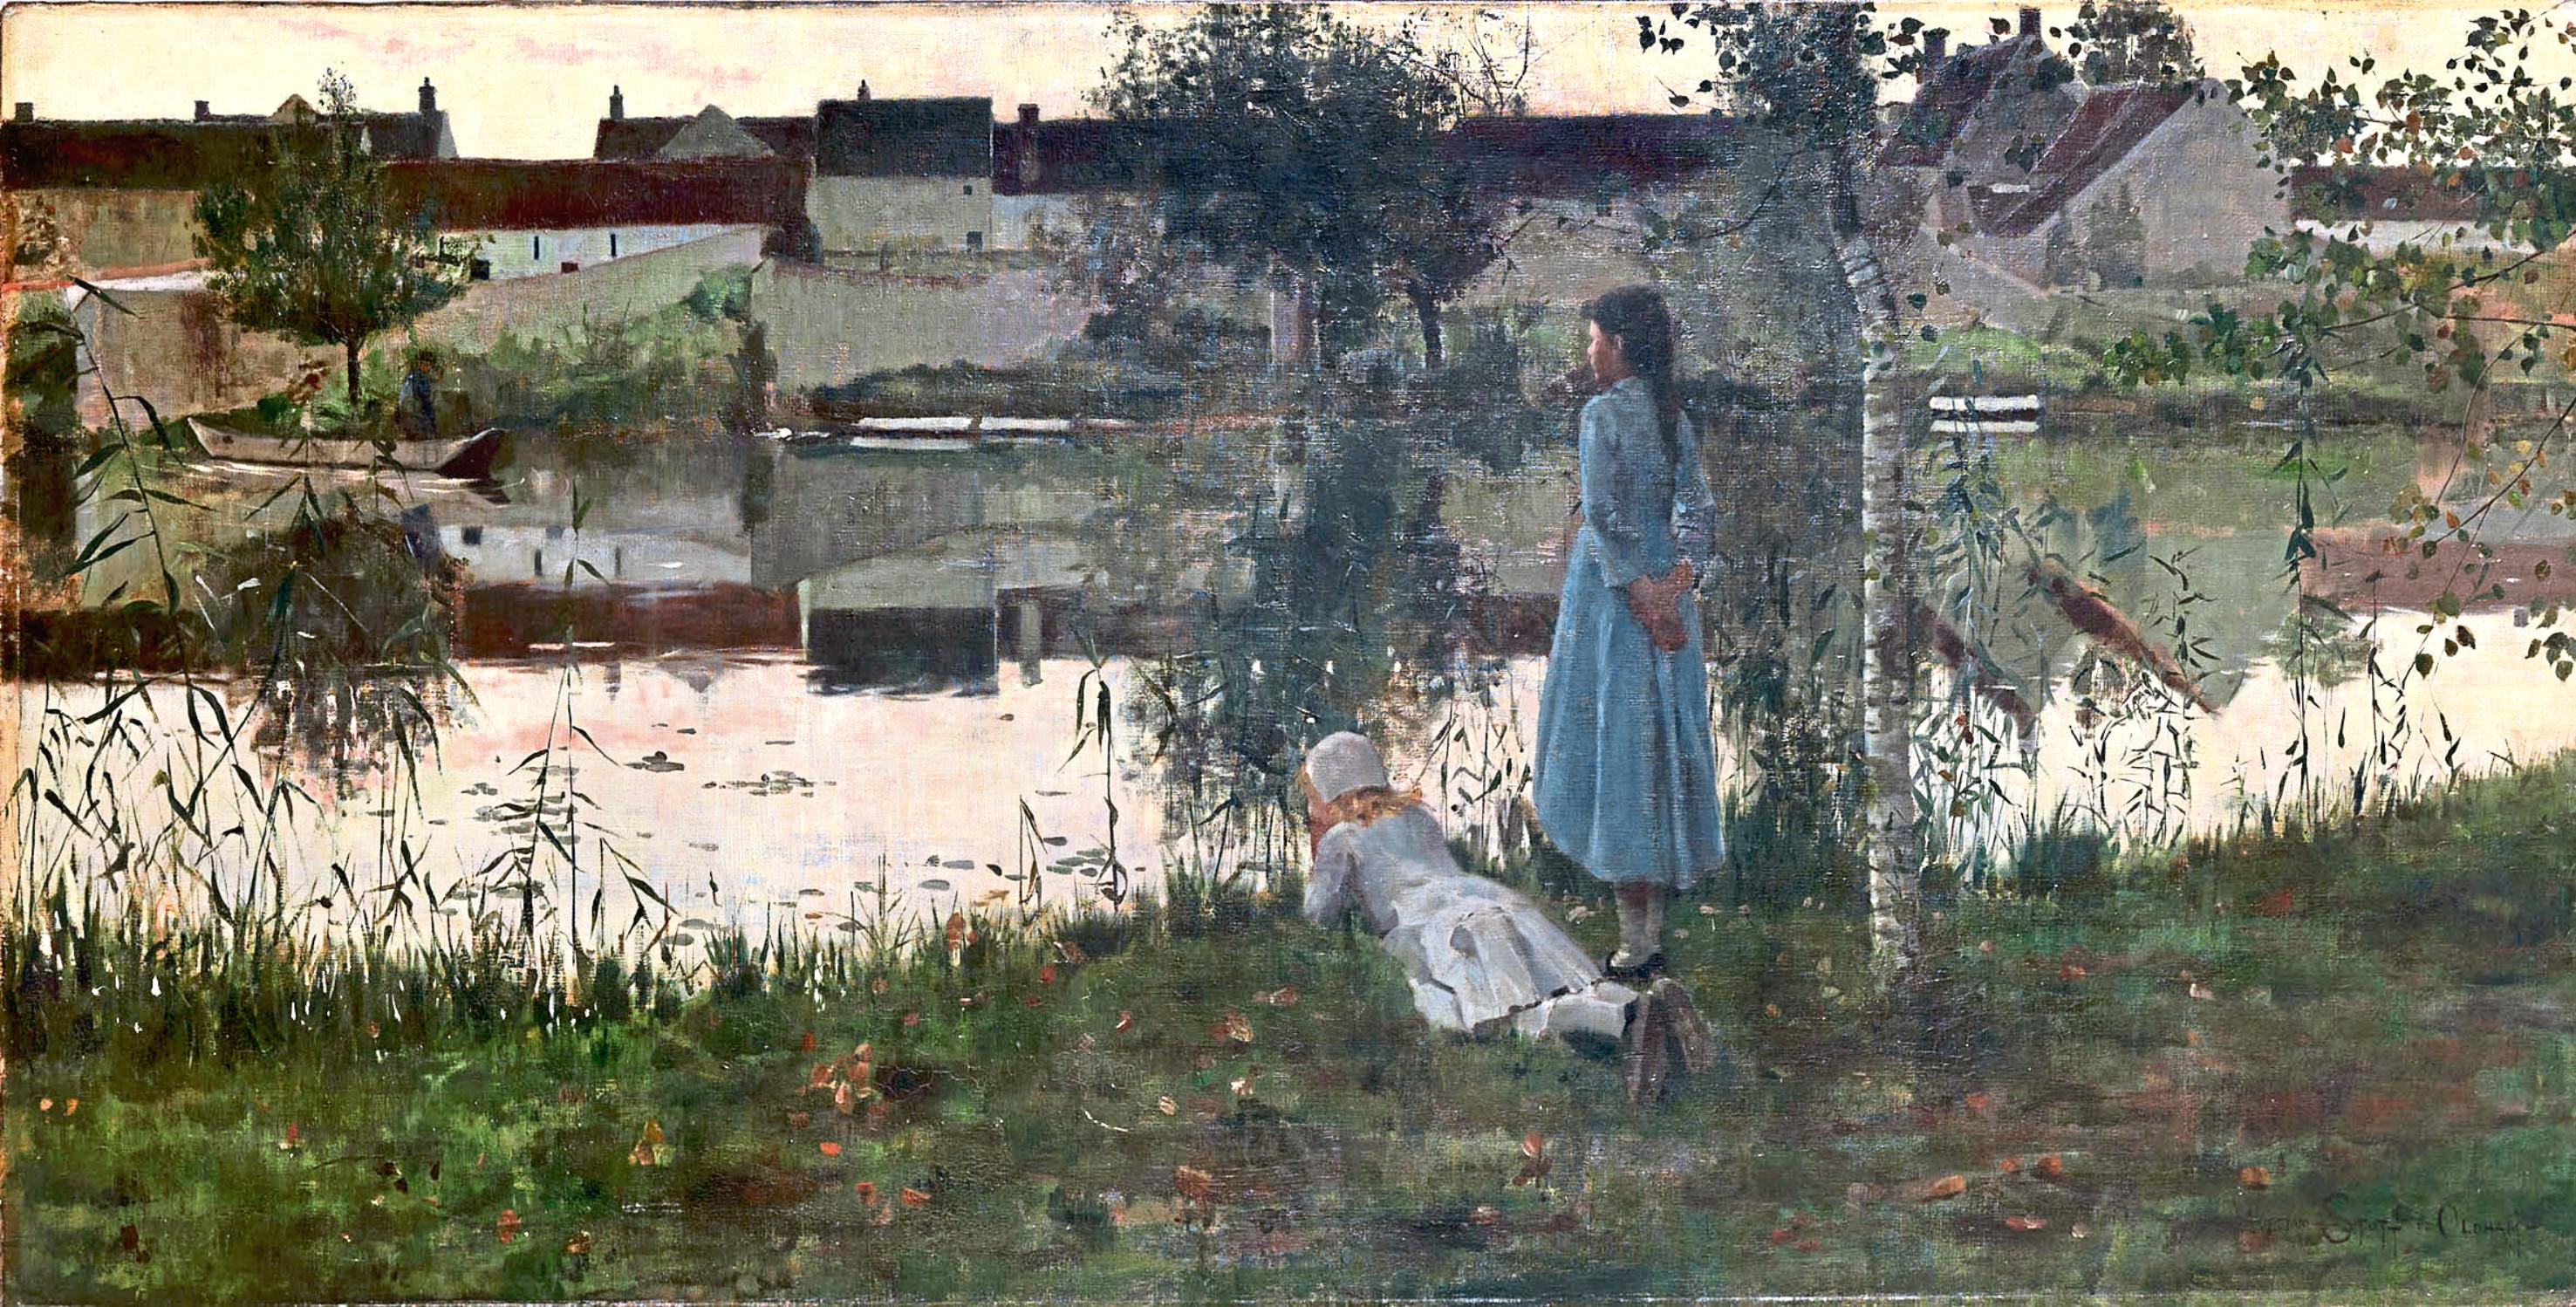 Le Passeur (The Ferryman), 1881, William Stott of Oldham